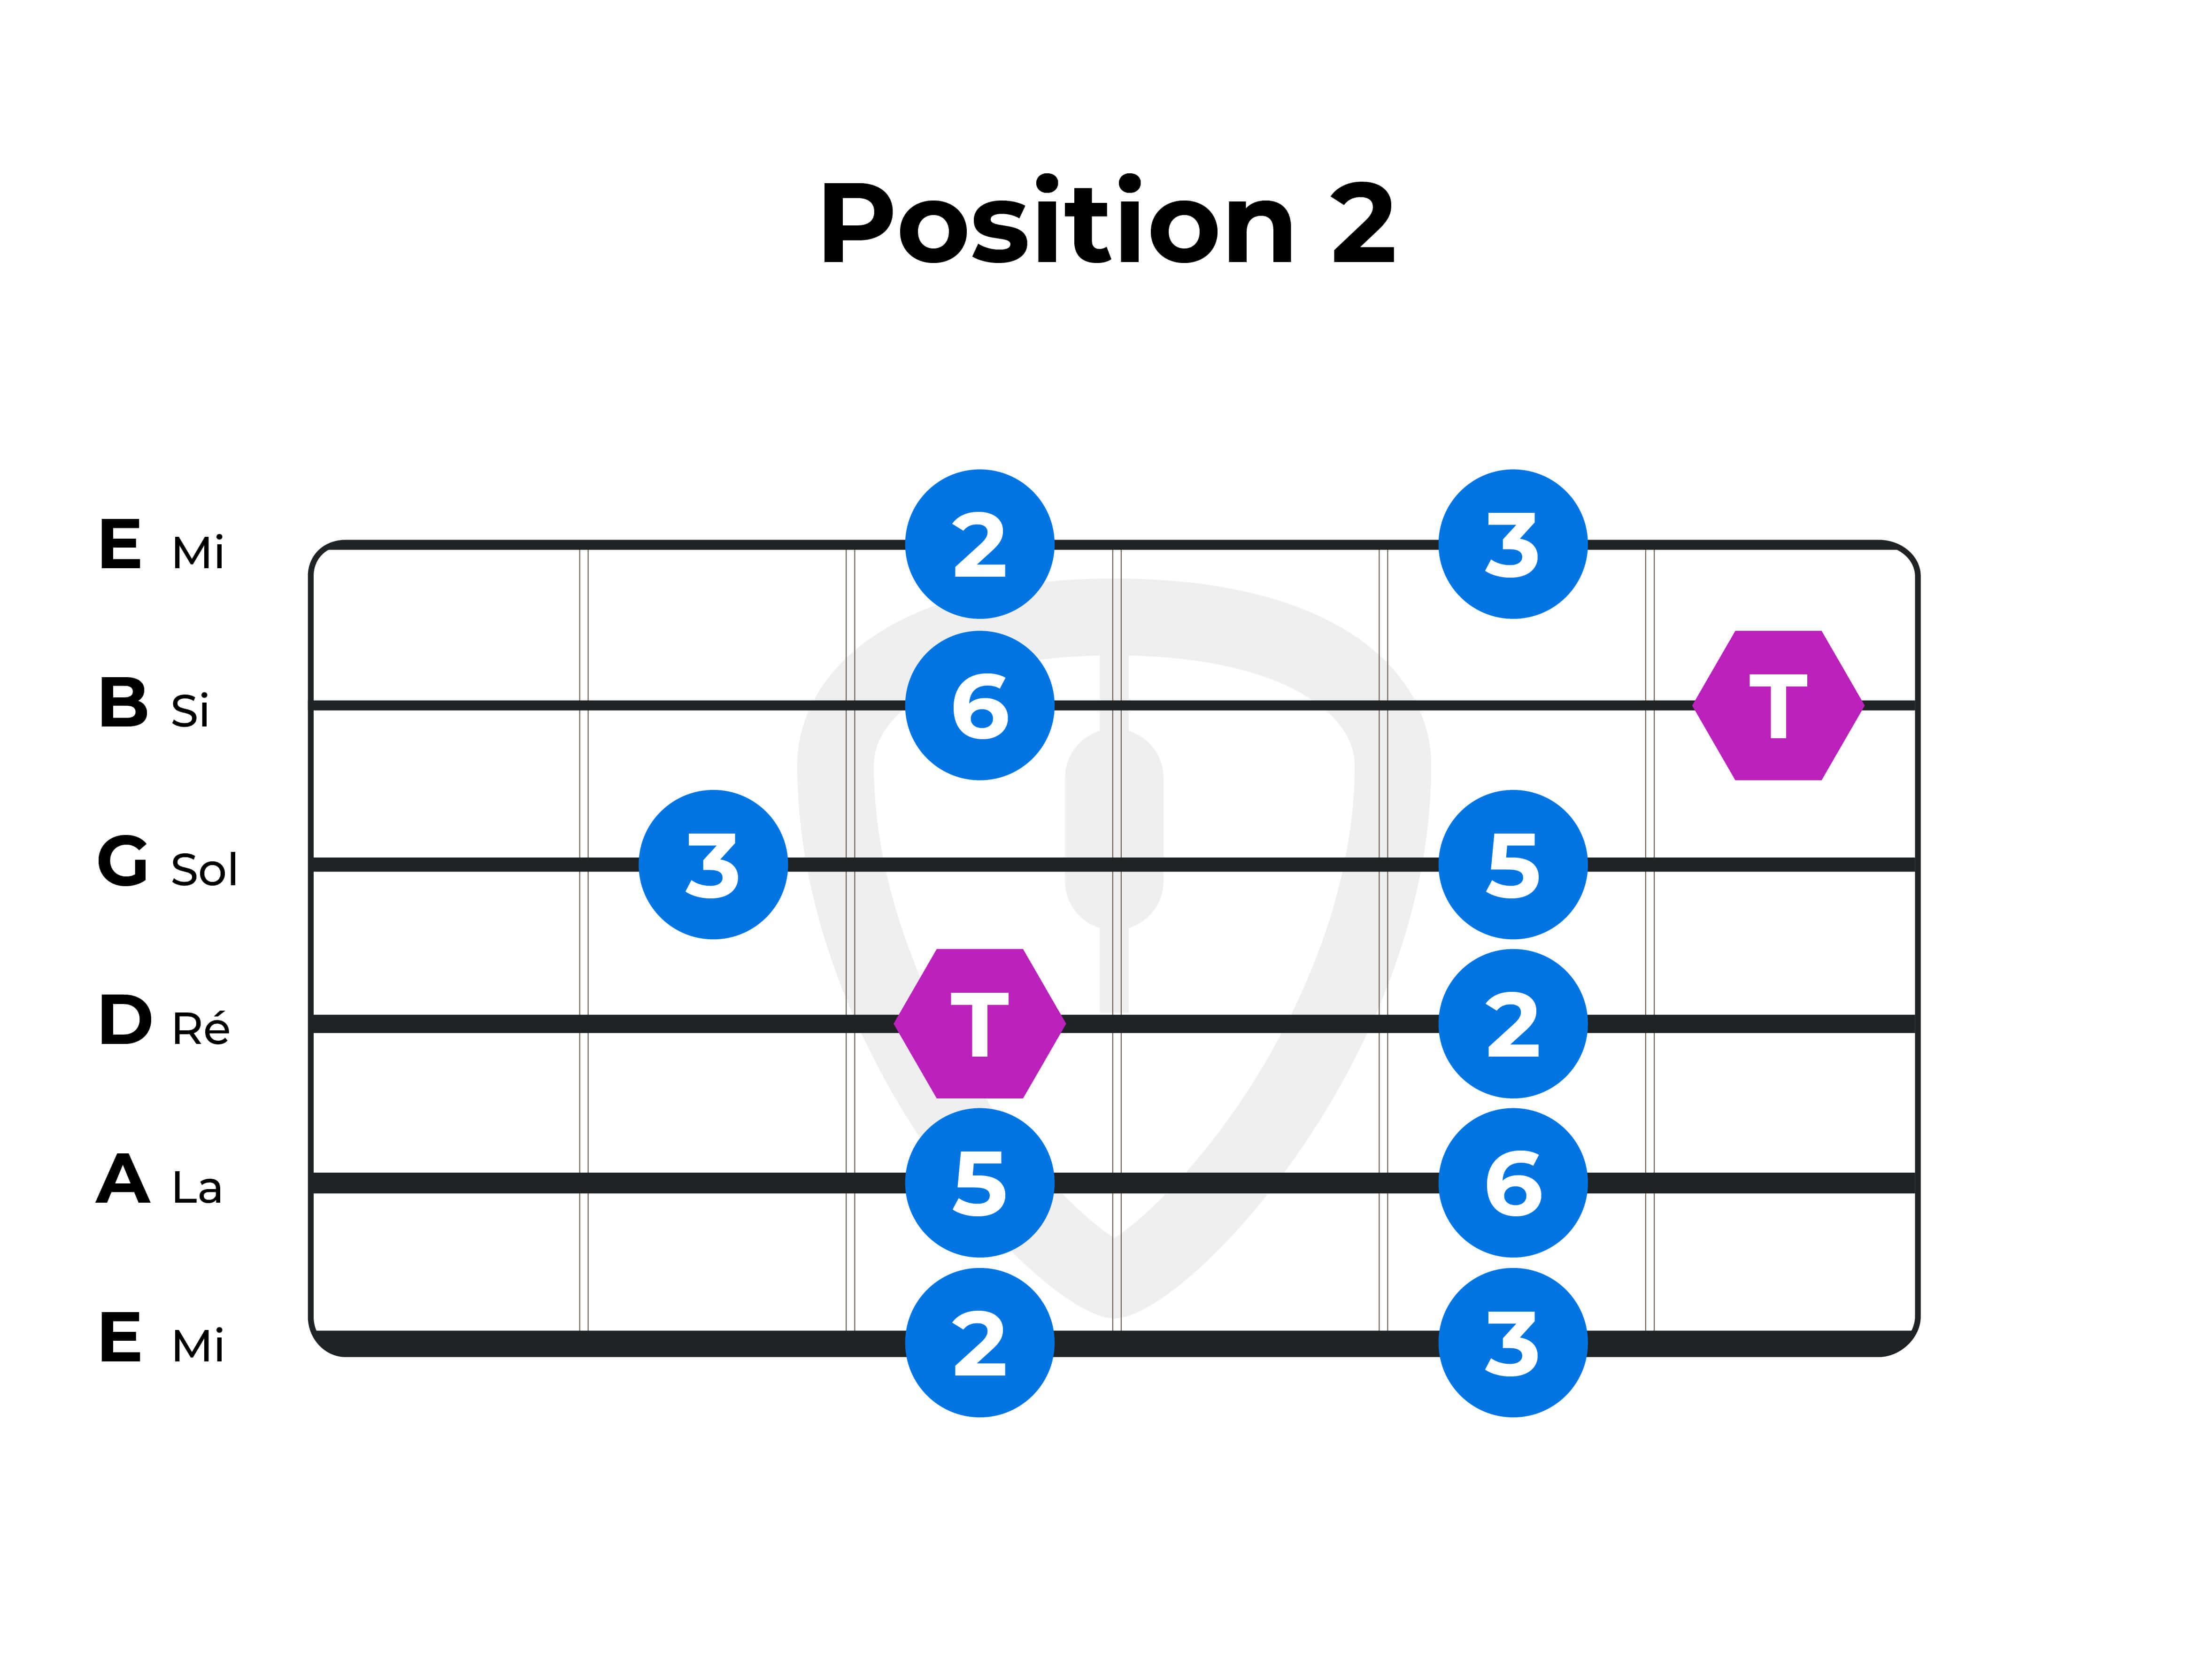 gamme pentatonique majeure guitare position 2